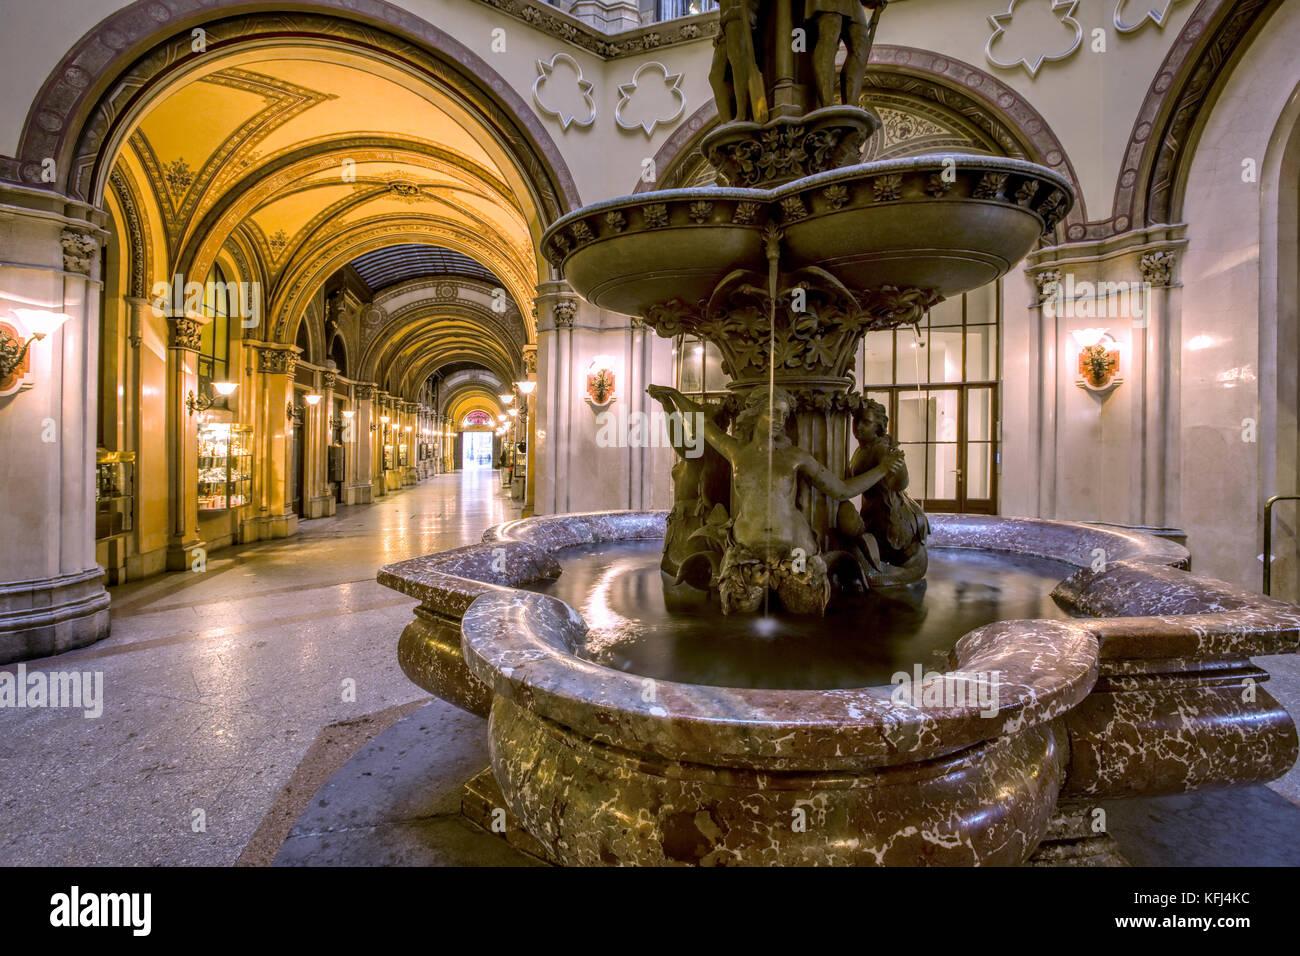 Freyung Passage in Palace Ferstel, Vienna - Stock Image